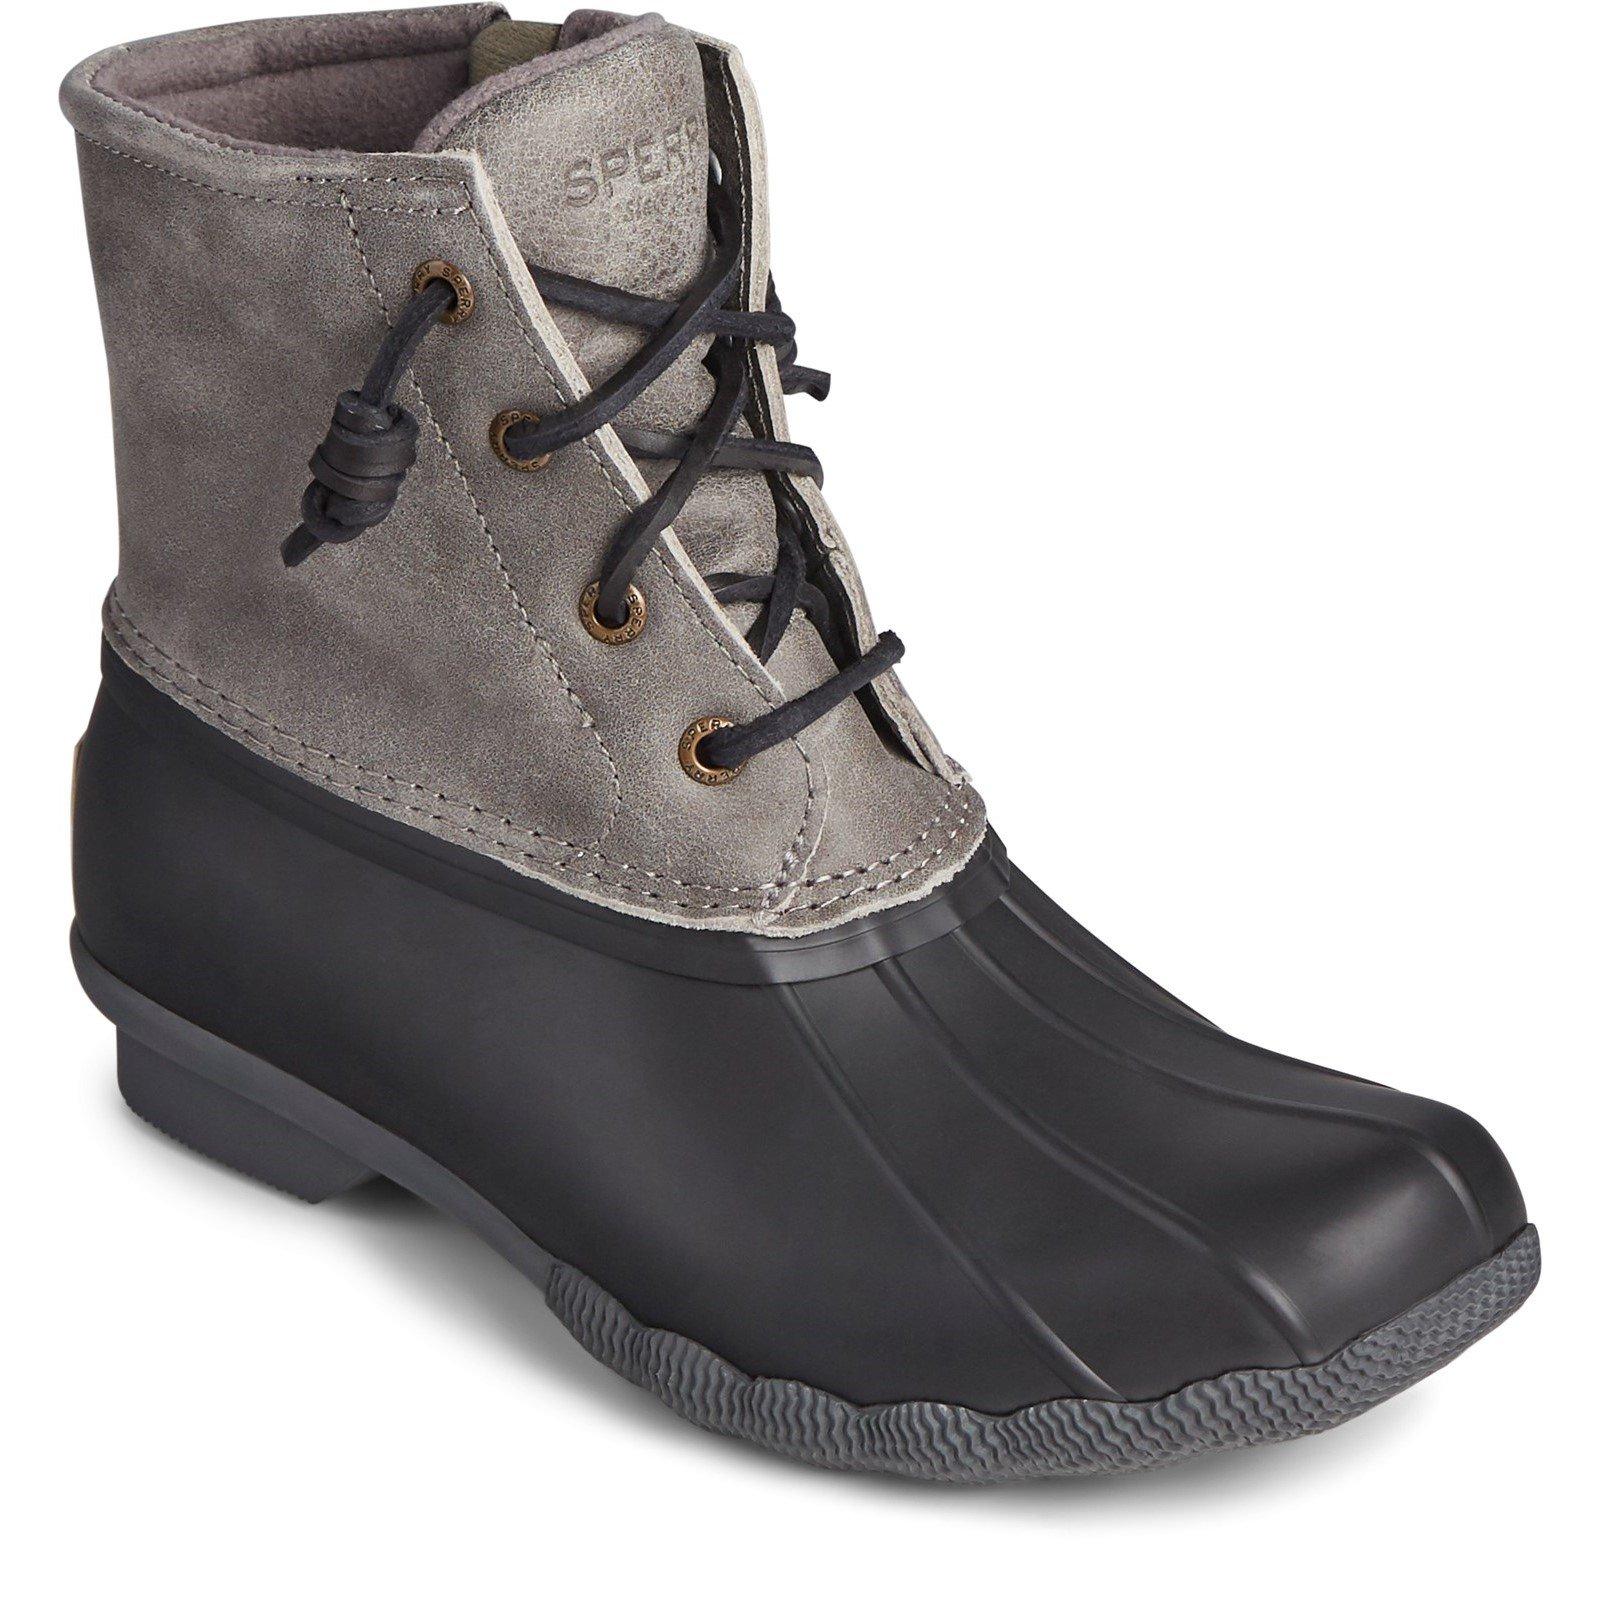 Sperry Women's Saltwater Core Mid Boot Multicolor 32407 - Black/Grey 6